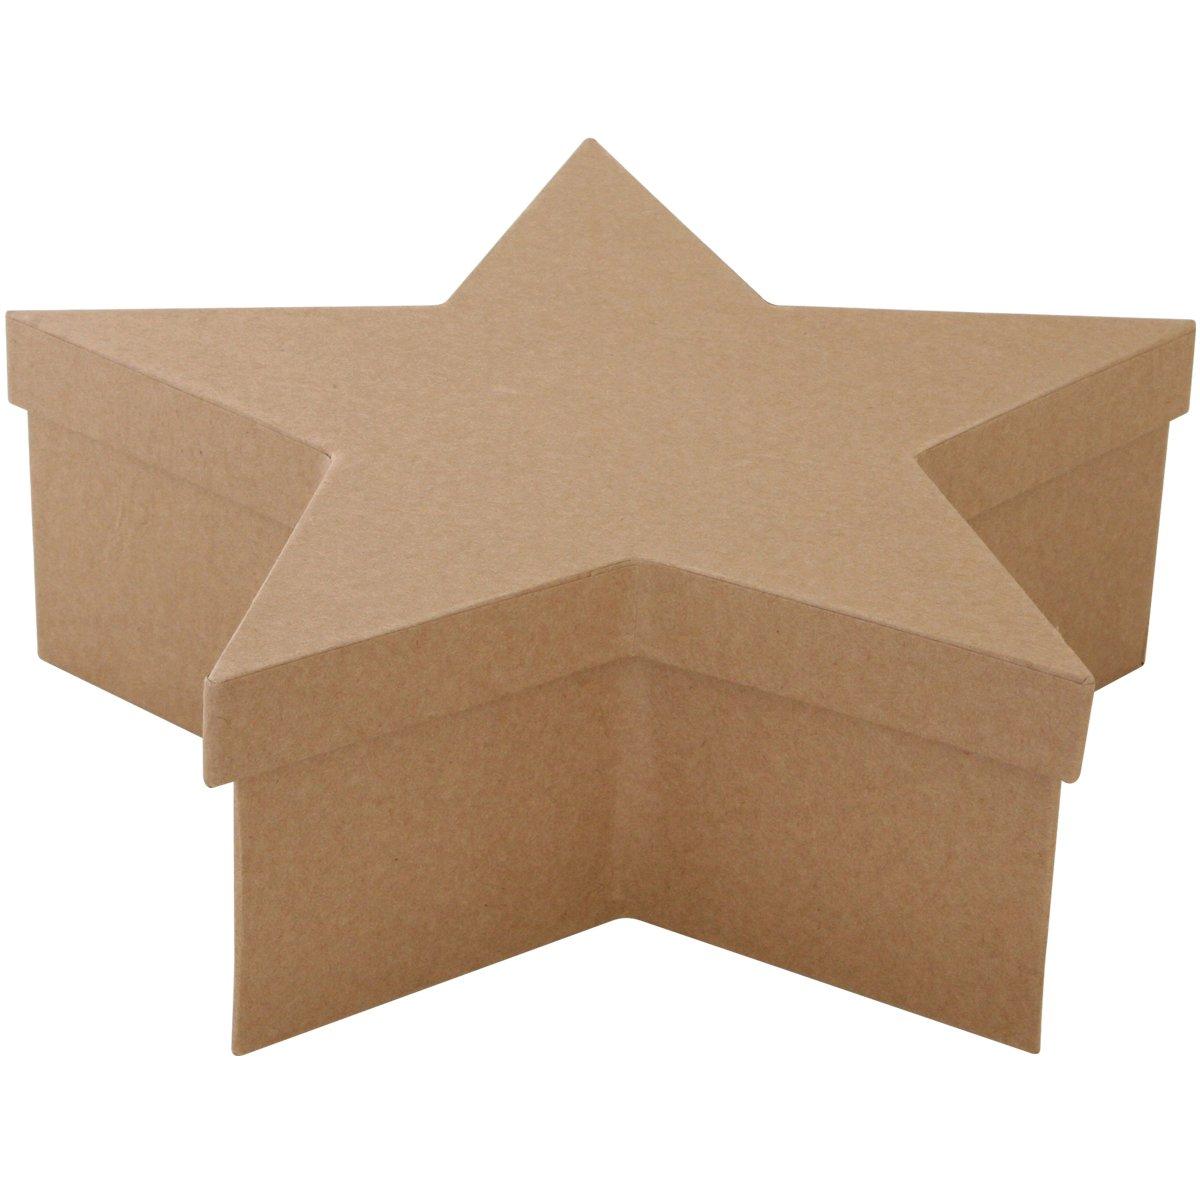 Art Alternatives MVPM06210 Paper-Mache Large Star-11.5 inches